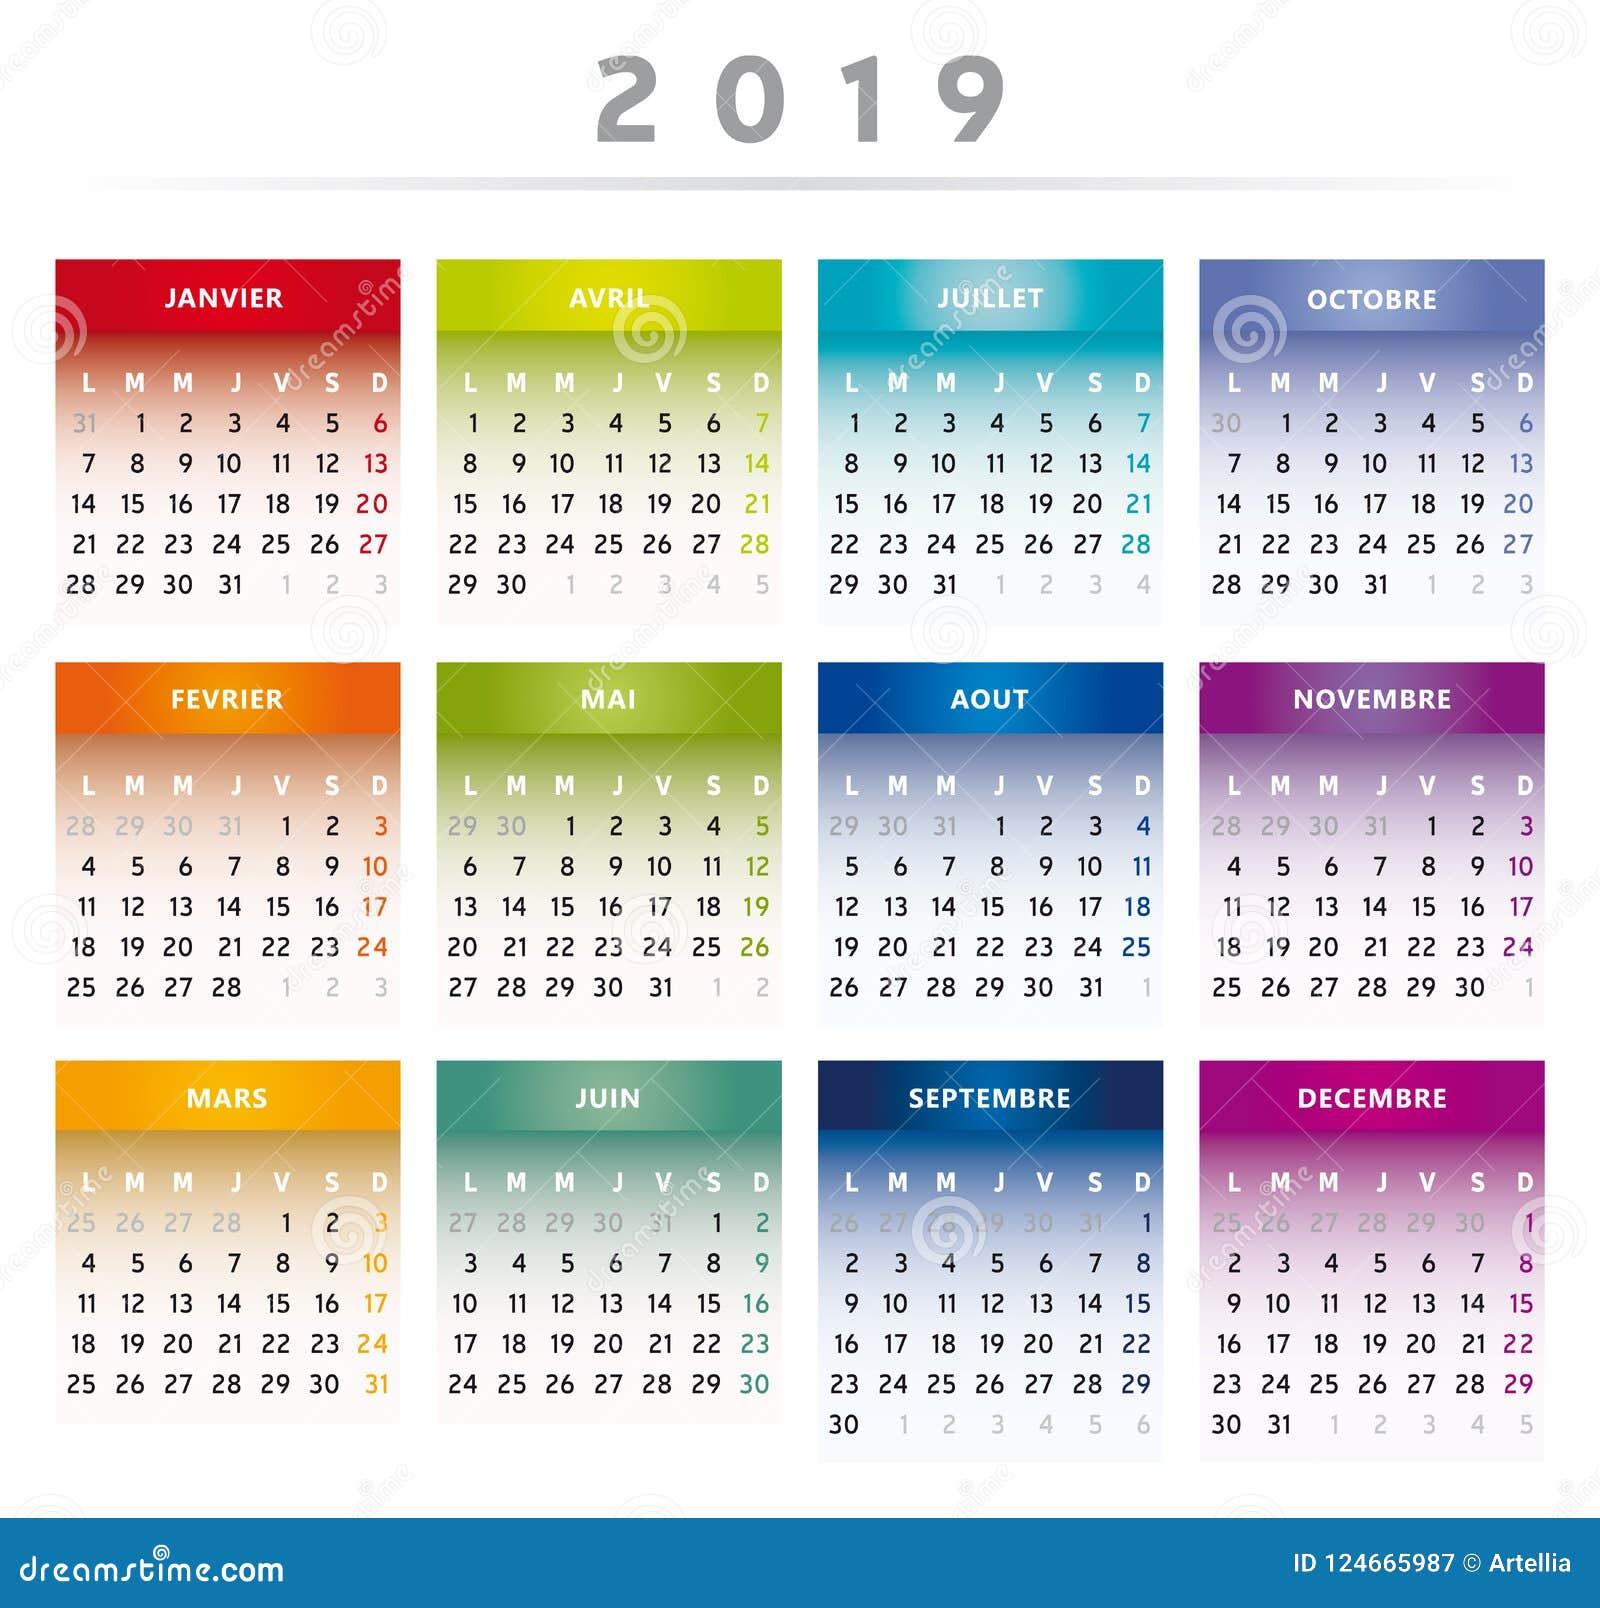 Calendario Rainbow.2019 Calendar With Boxes In Rainbow Colors 4 Columns